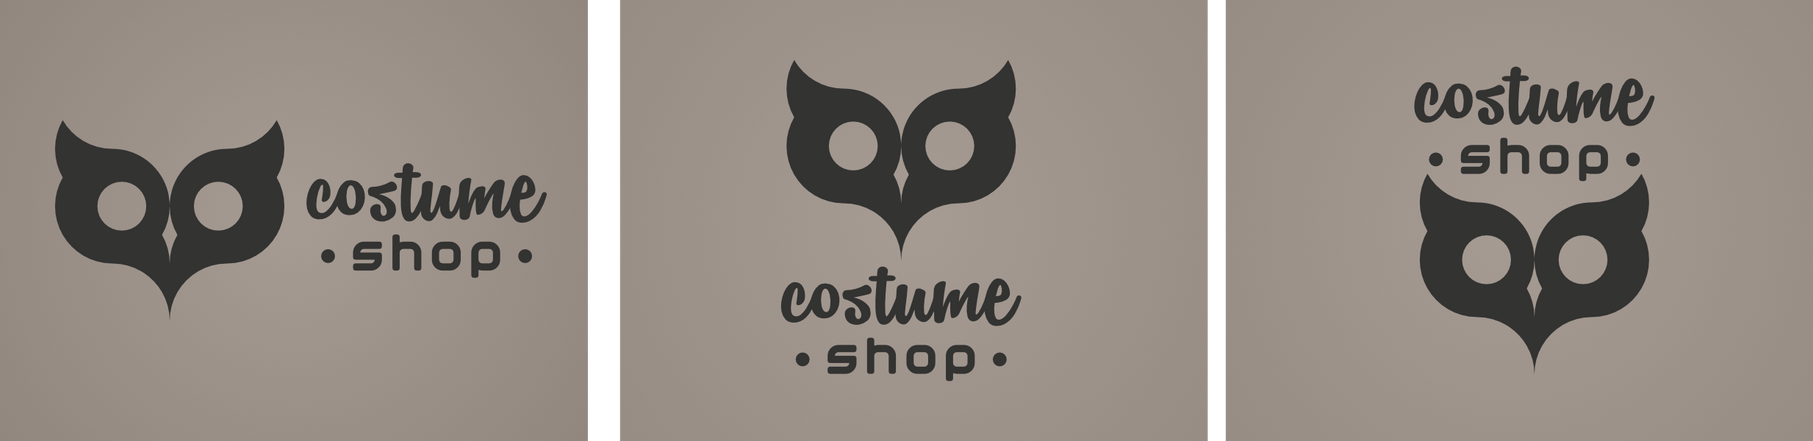 Costume Shop logo